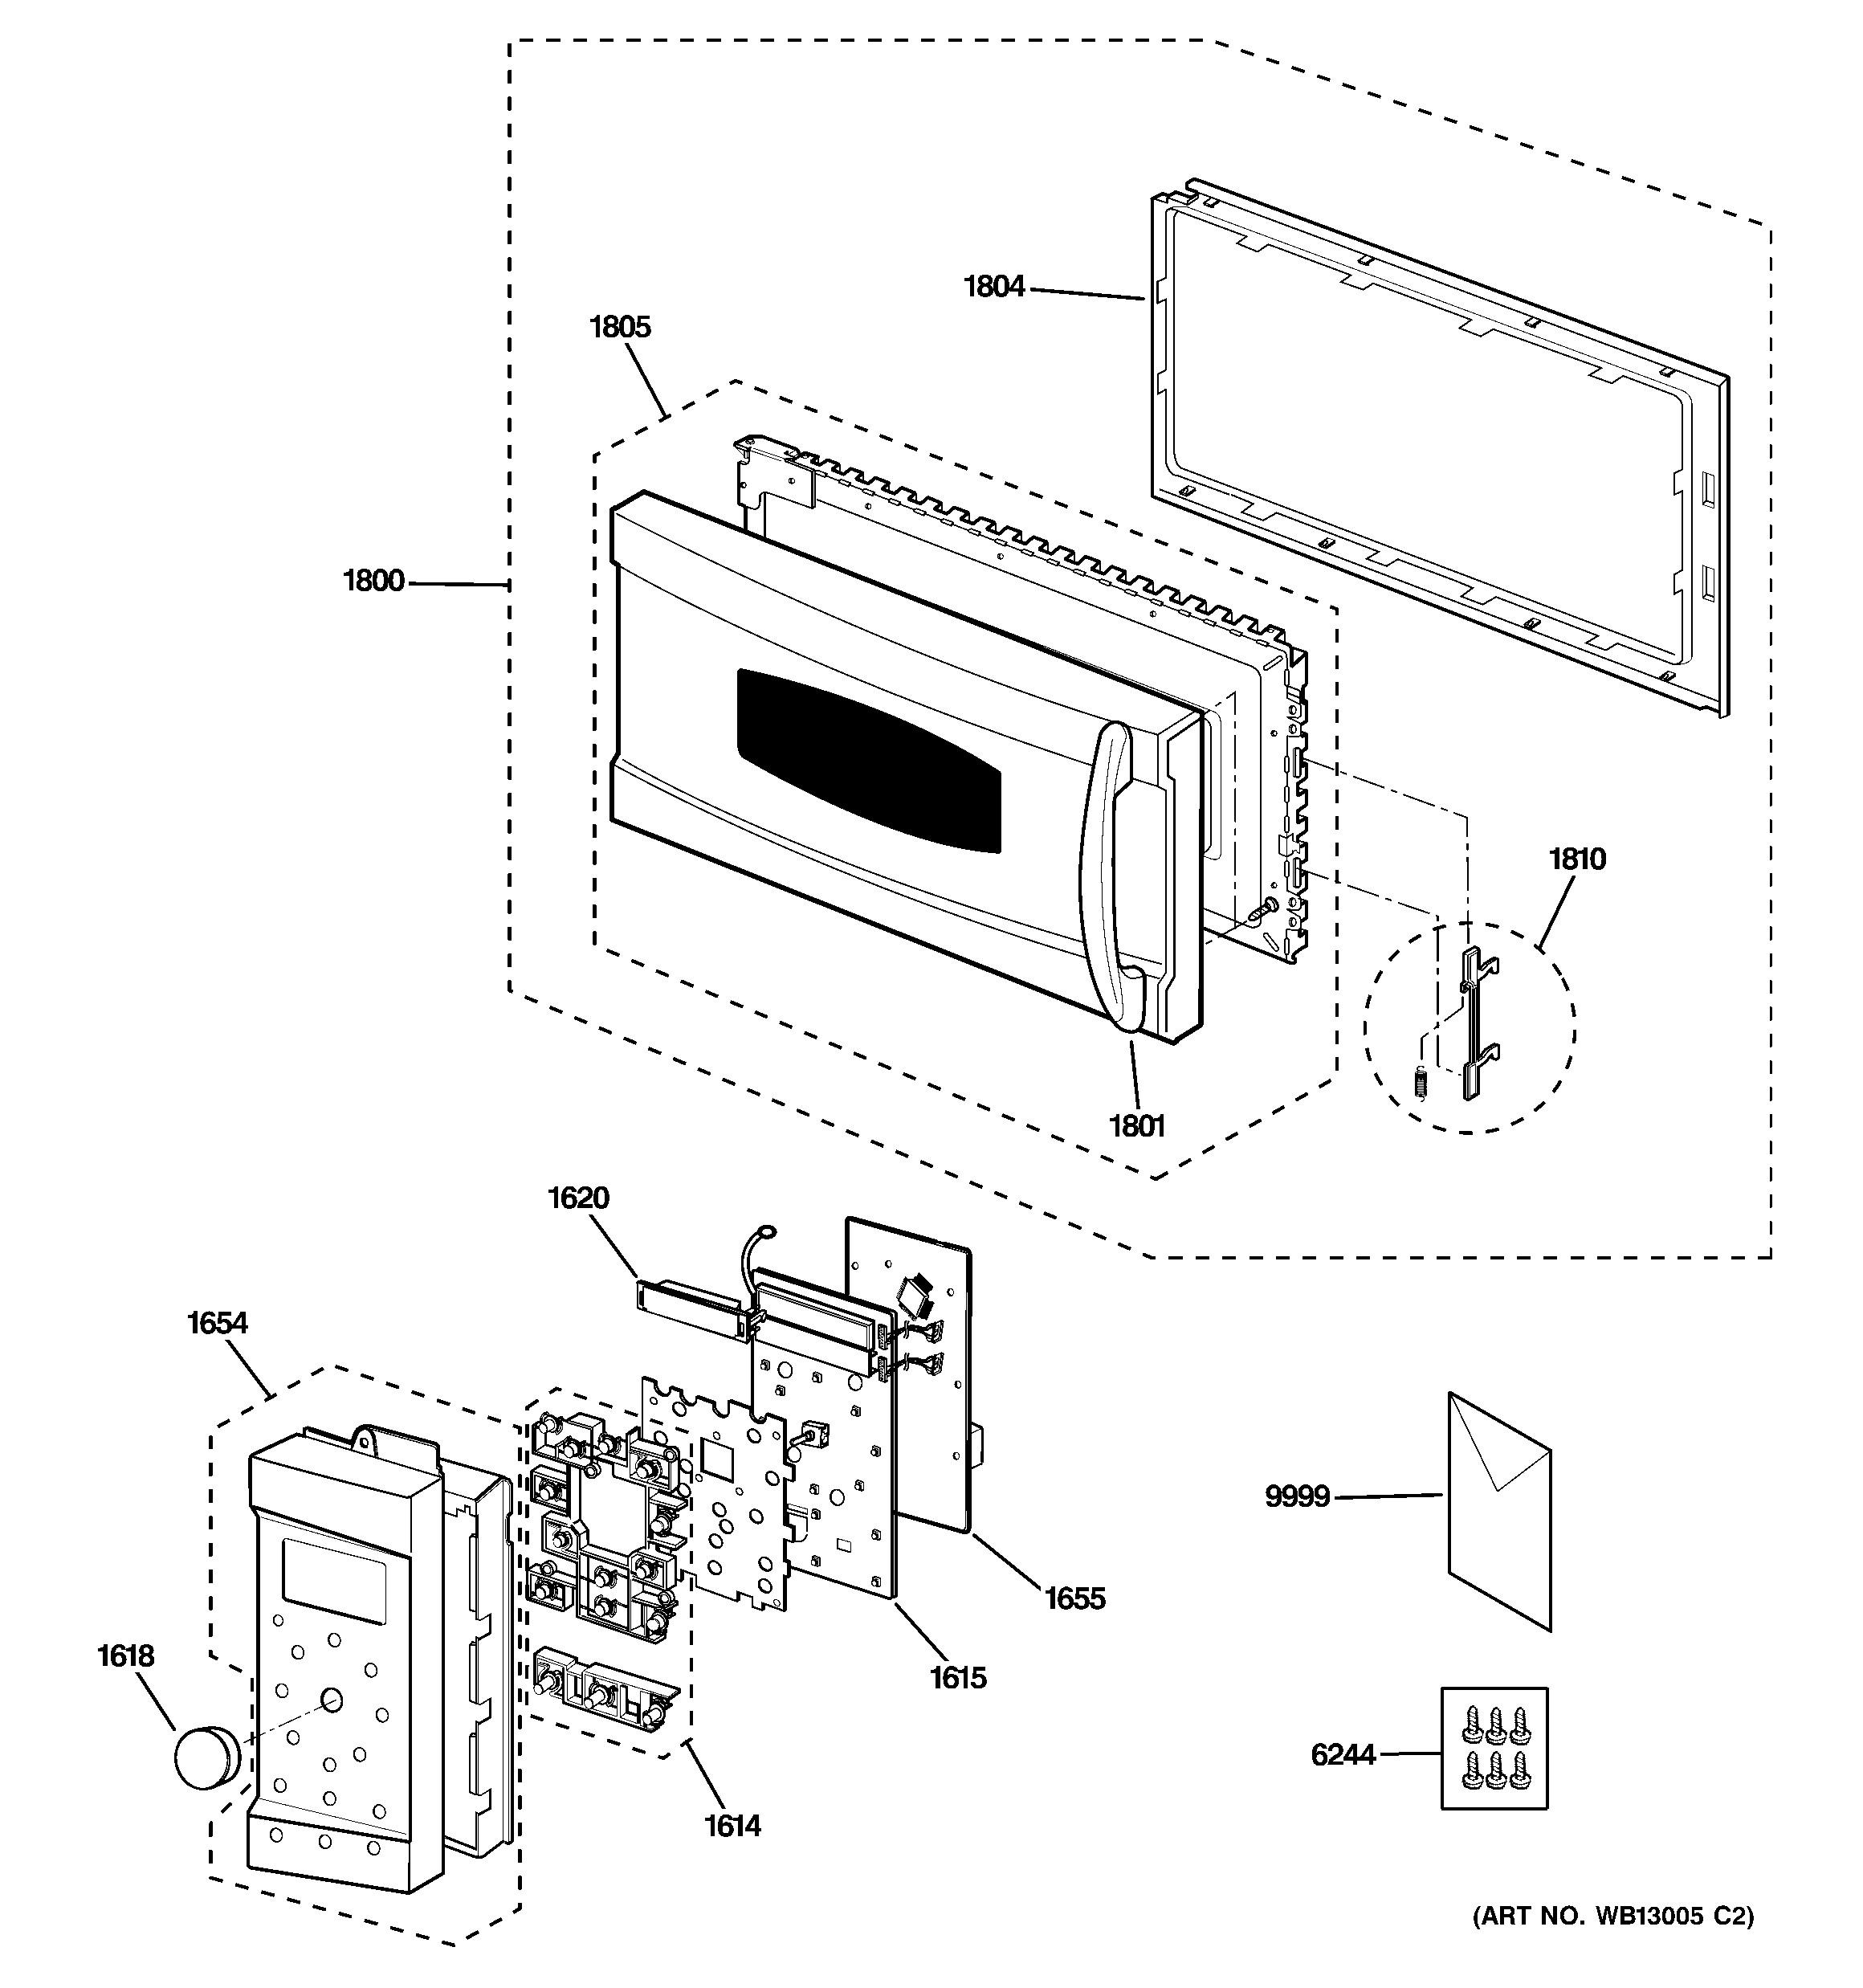 Ge Advantium 120 Parts Diagram Ge Model Sca1000hbb03 Microwave Hood Bo Genuine Parts Of Ge Advantium 120 Parts Diagram